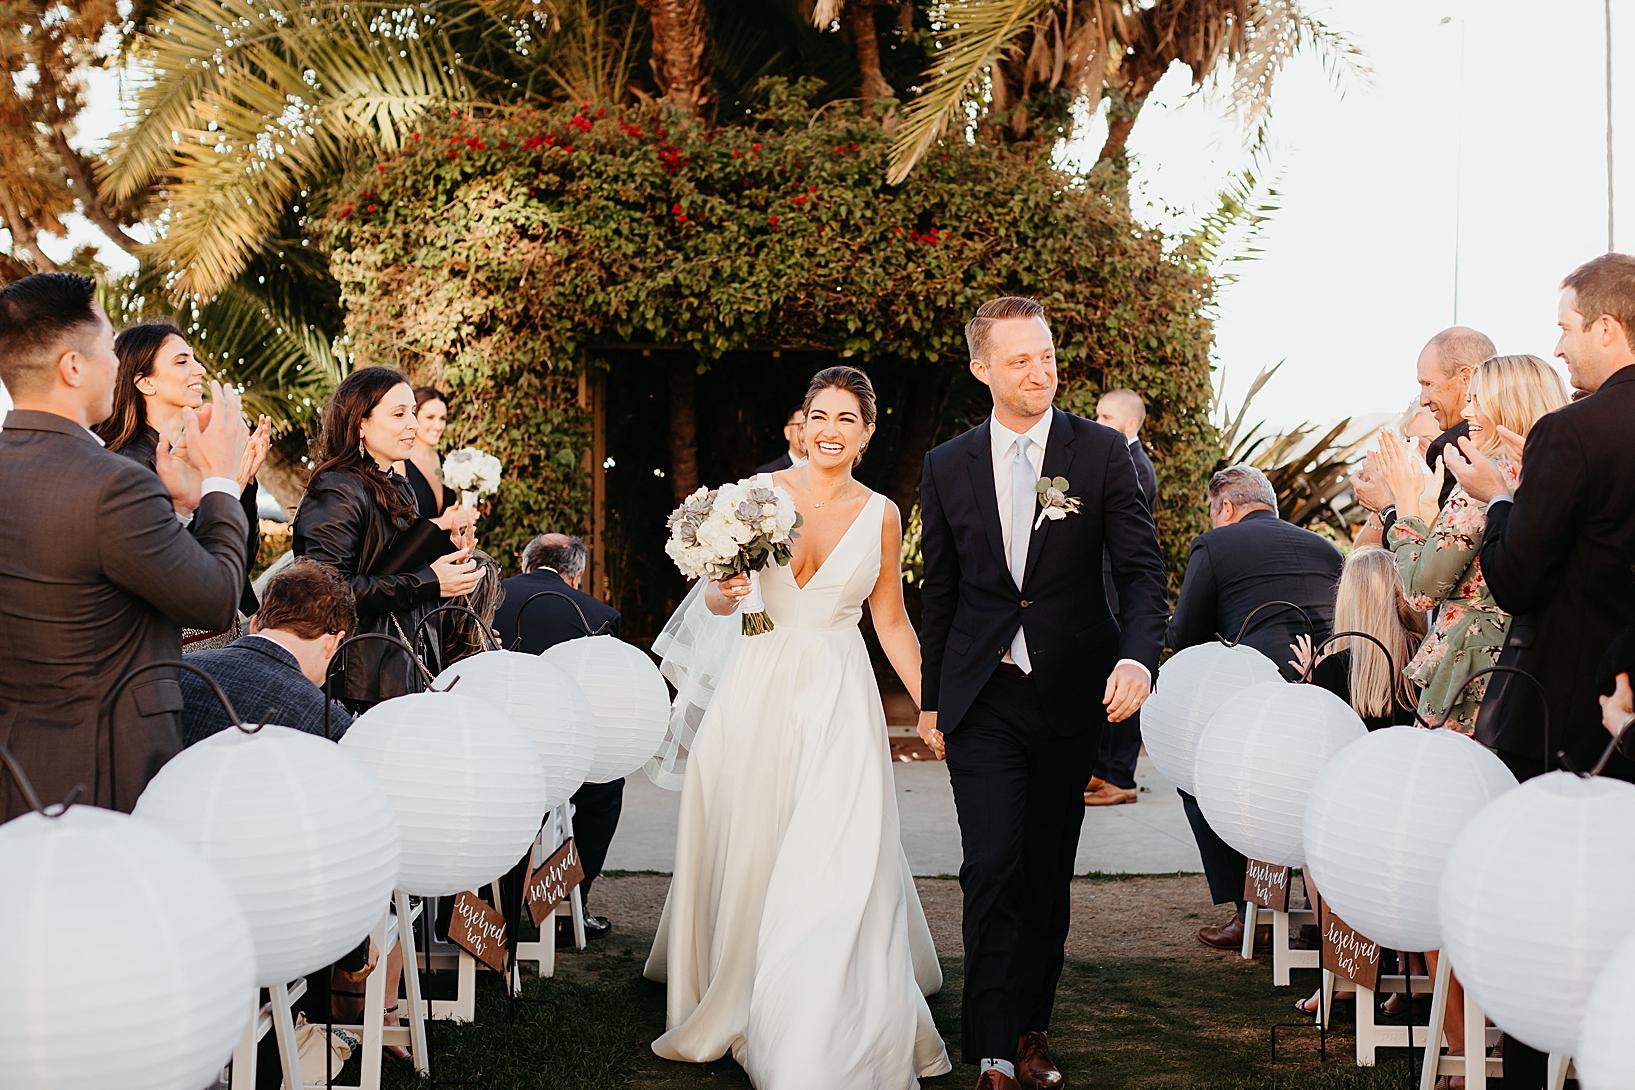 Herb-and-Wood-Wedding-45.jpg